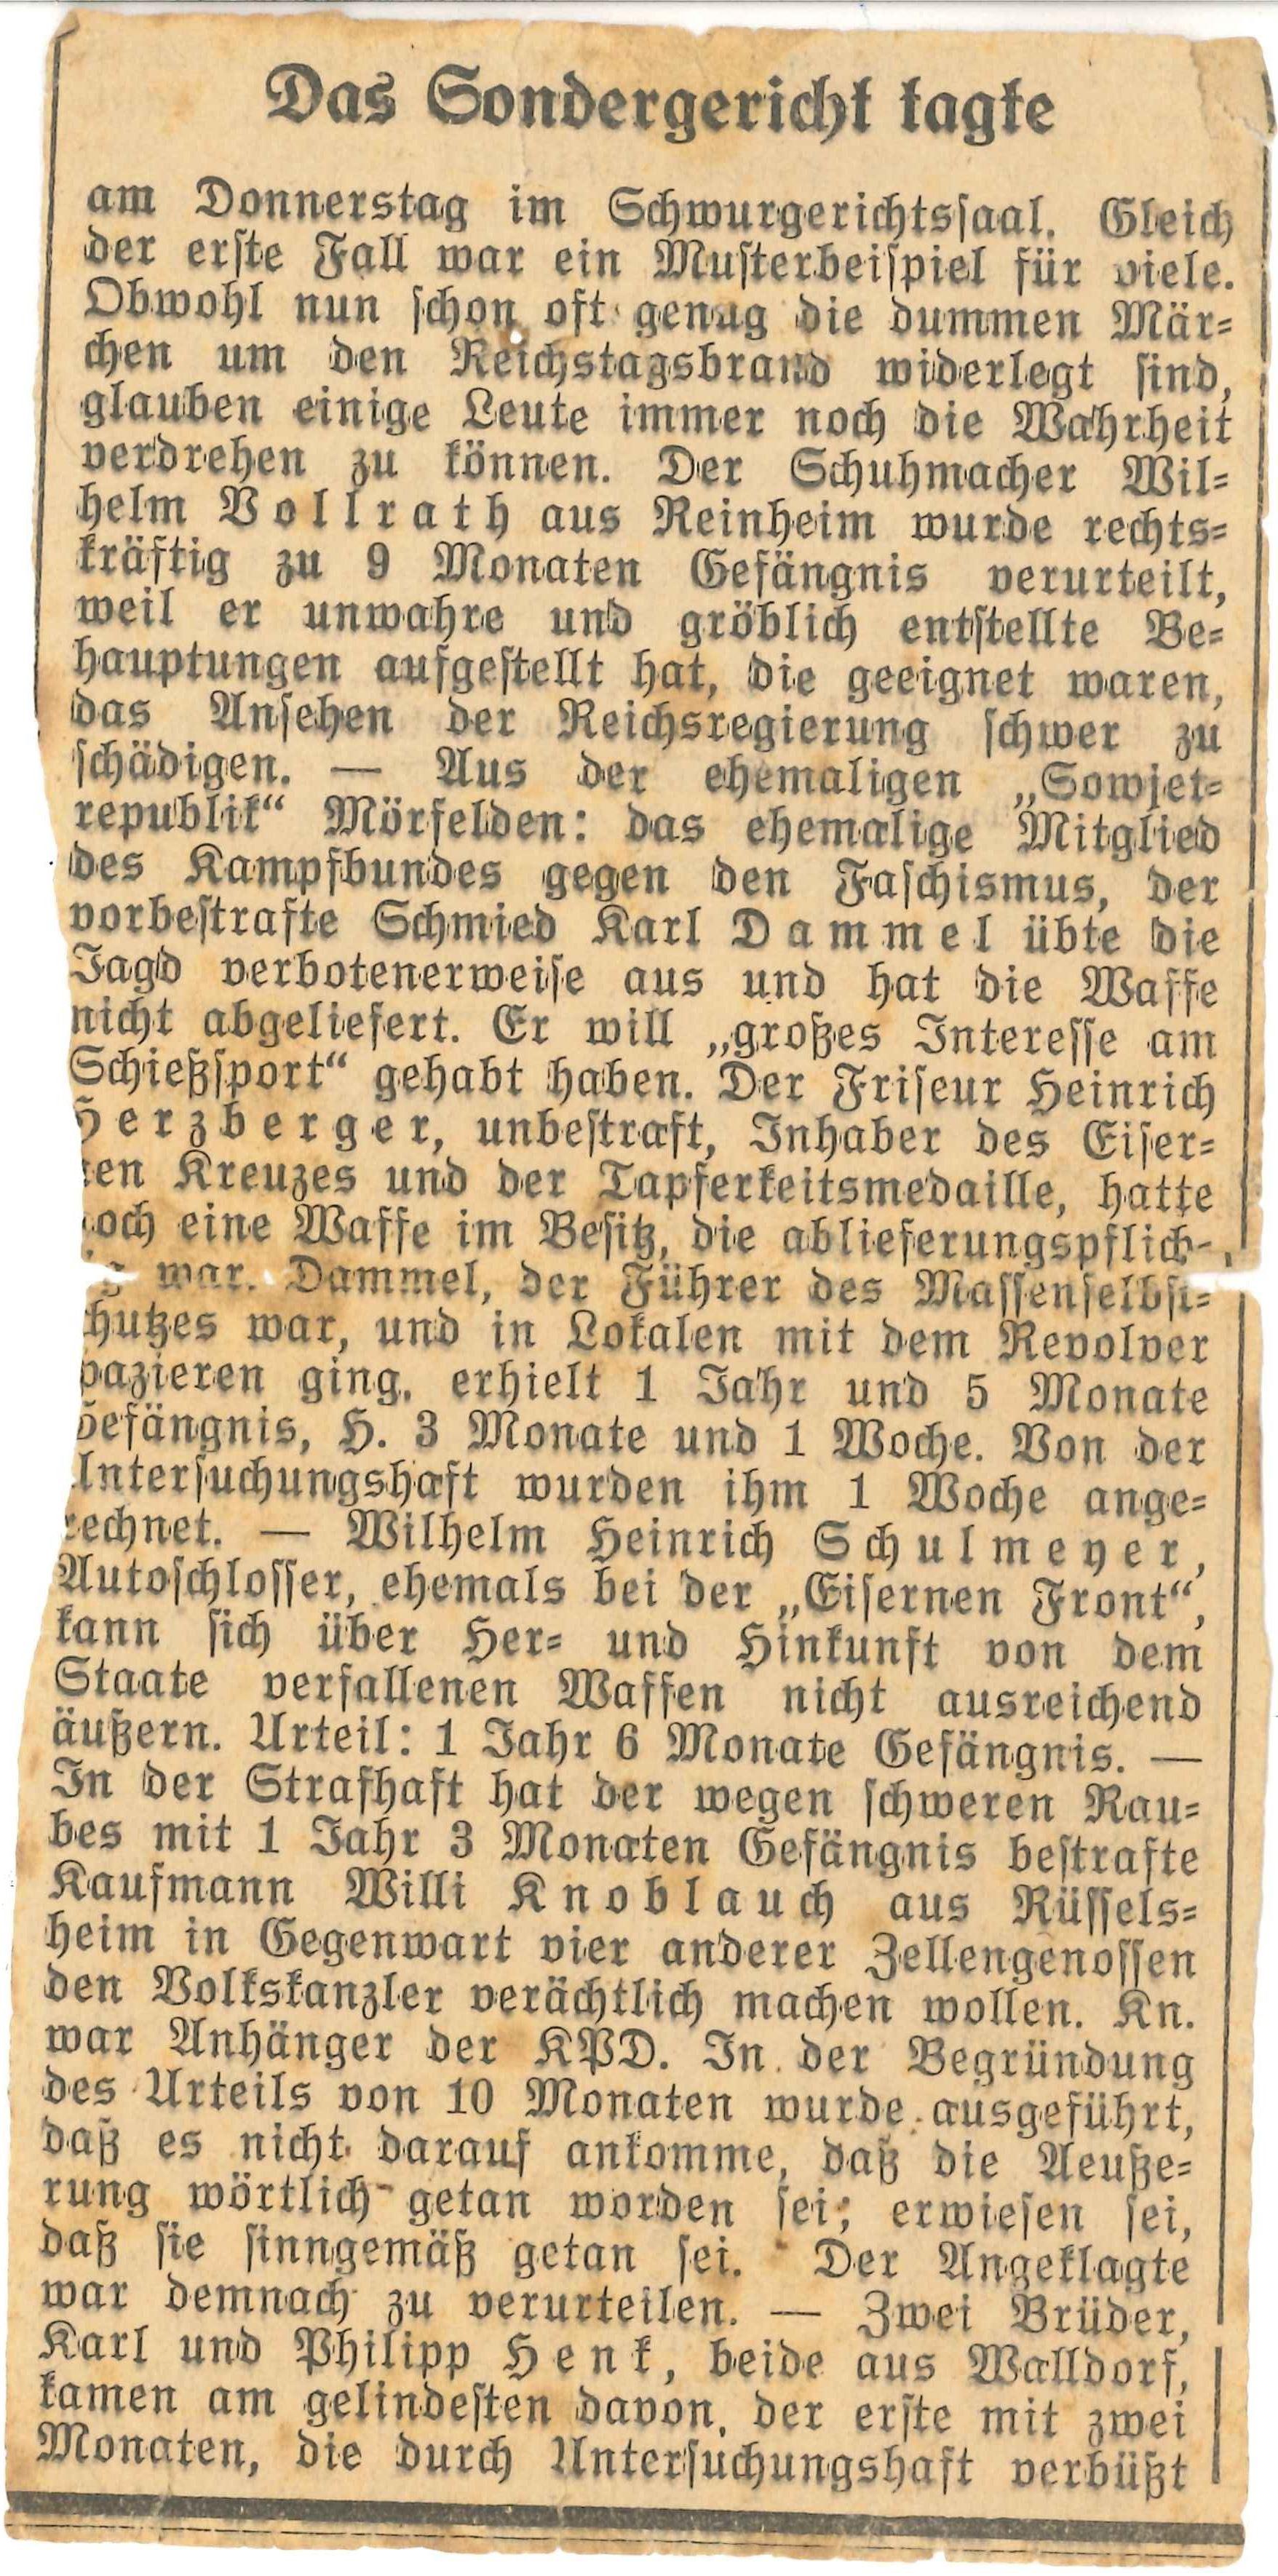 Tafel 3 Foto  4 Zeitungsausschnitt Sondergericht tagte Original Mus. Mö